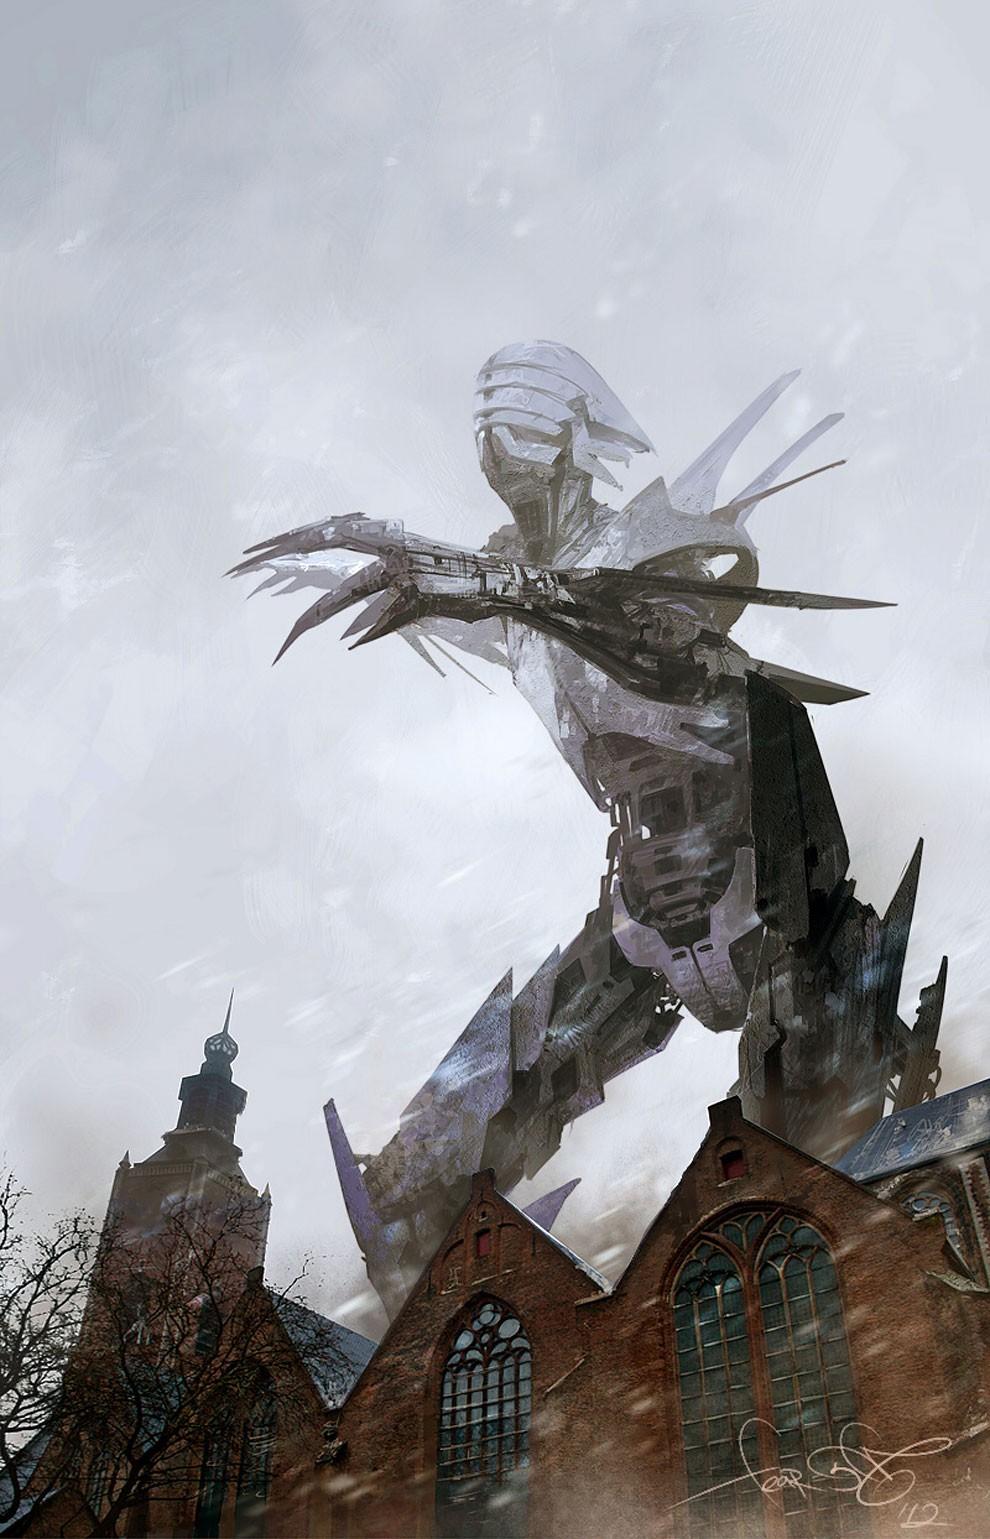 illustrazioni-dipinti-digitali-humor-horror-fantasy-sergey-svistunov-38